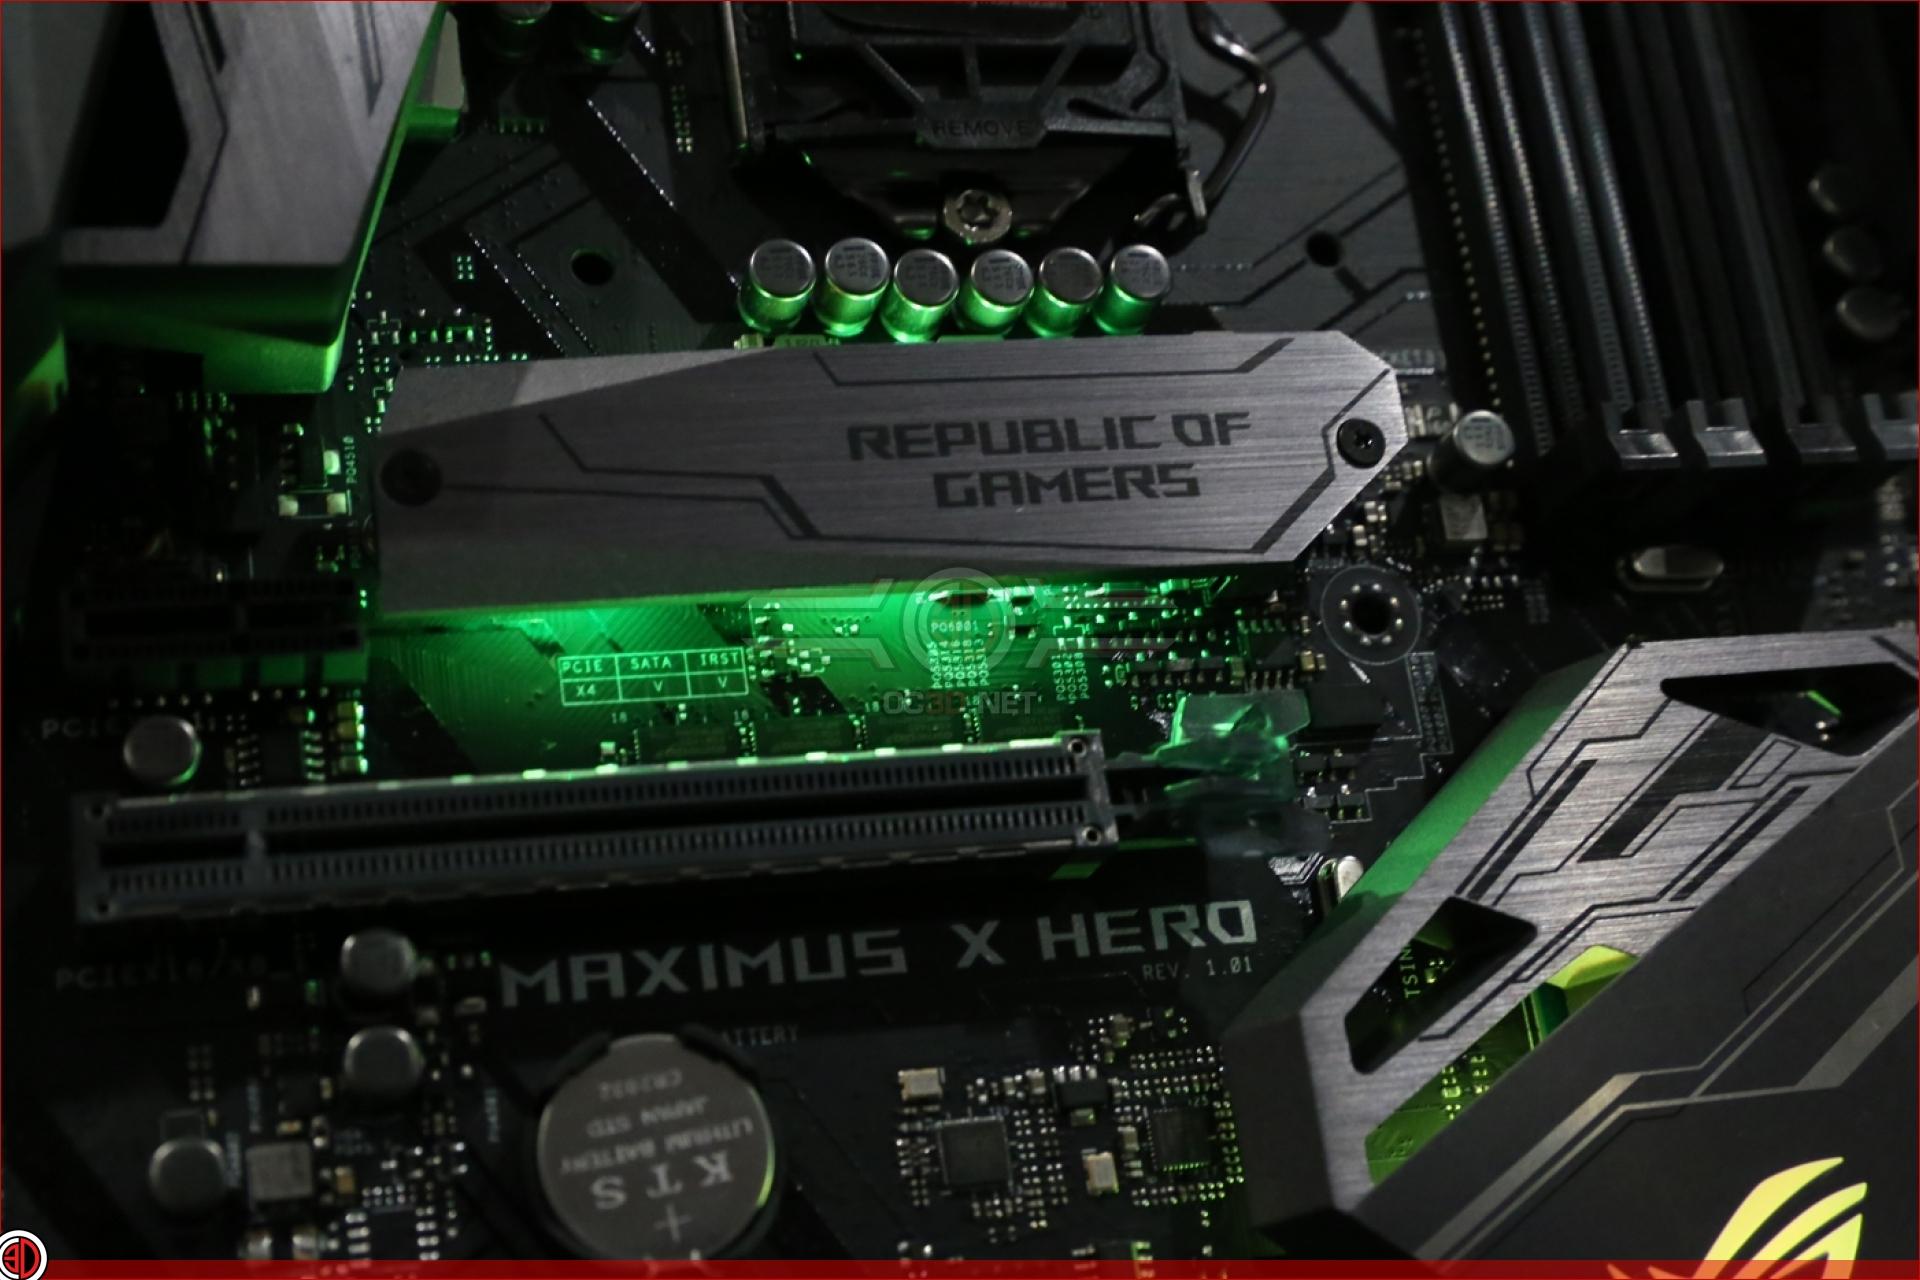 ASUS Z370 Maximus X Hero Review Lighting CPU